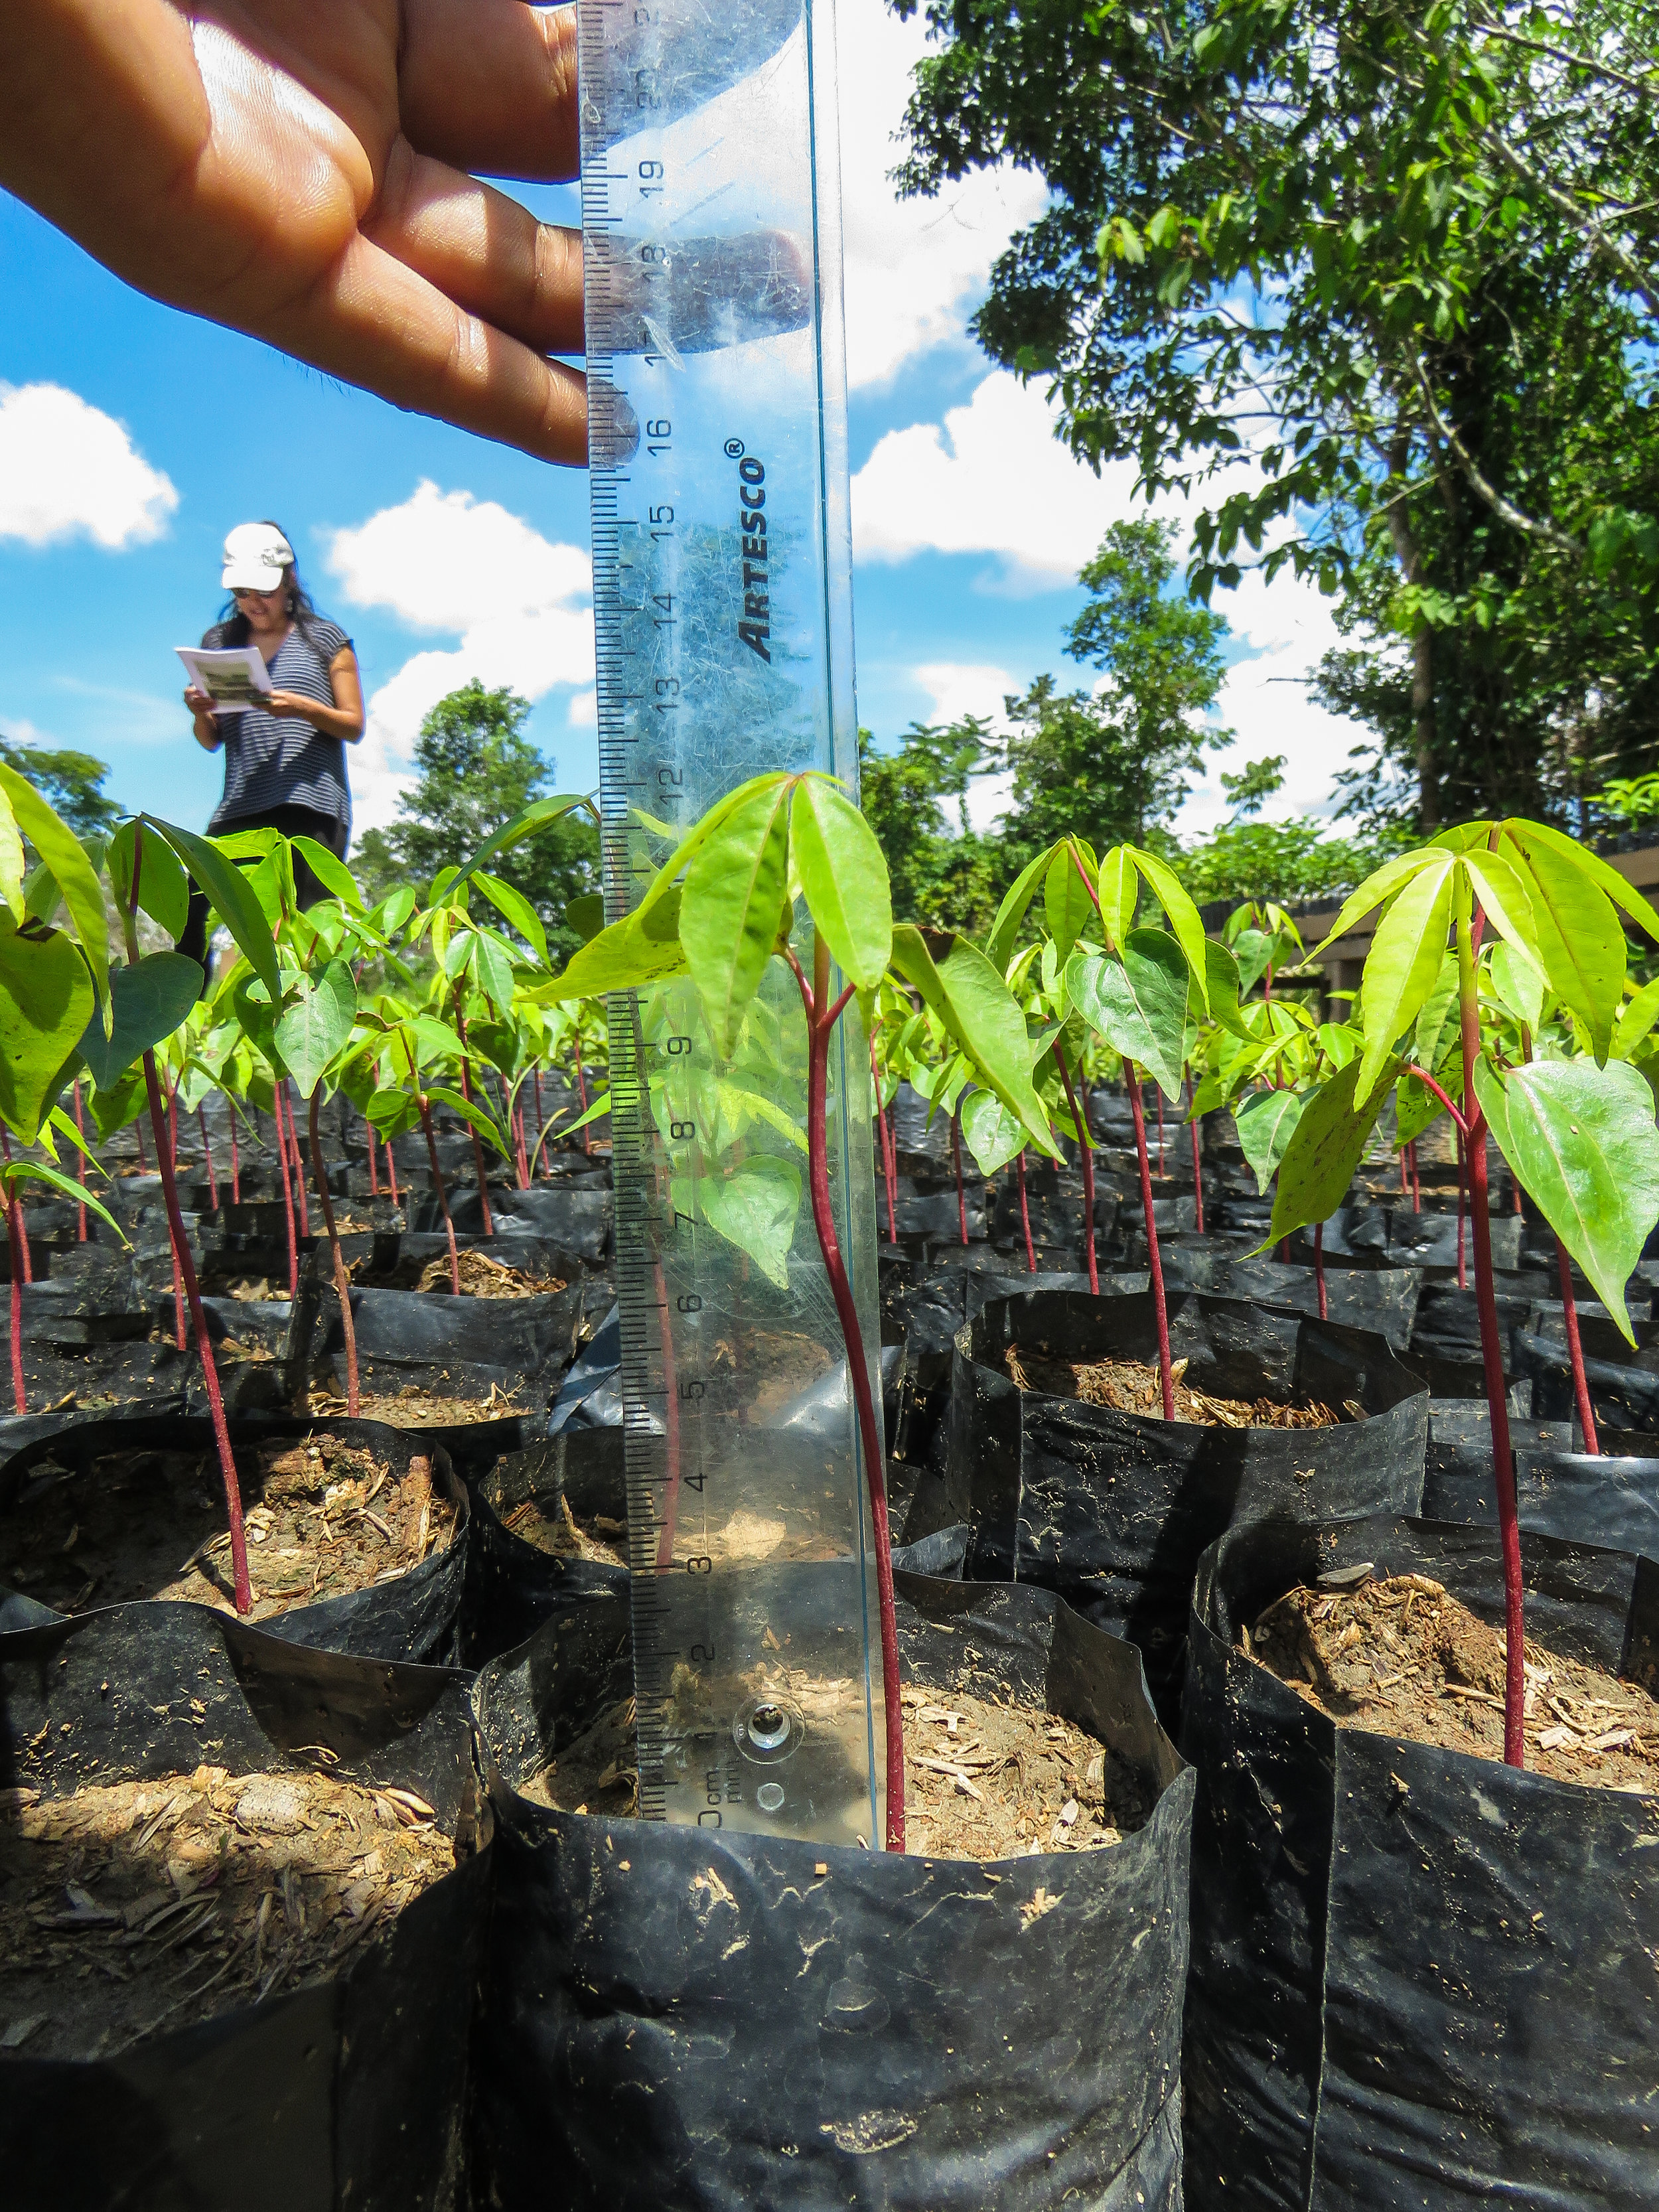 CINCIA researchers measure seedlings at La Joya.